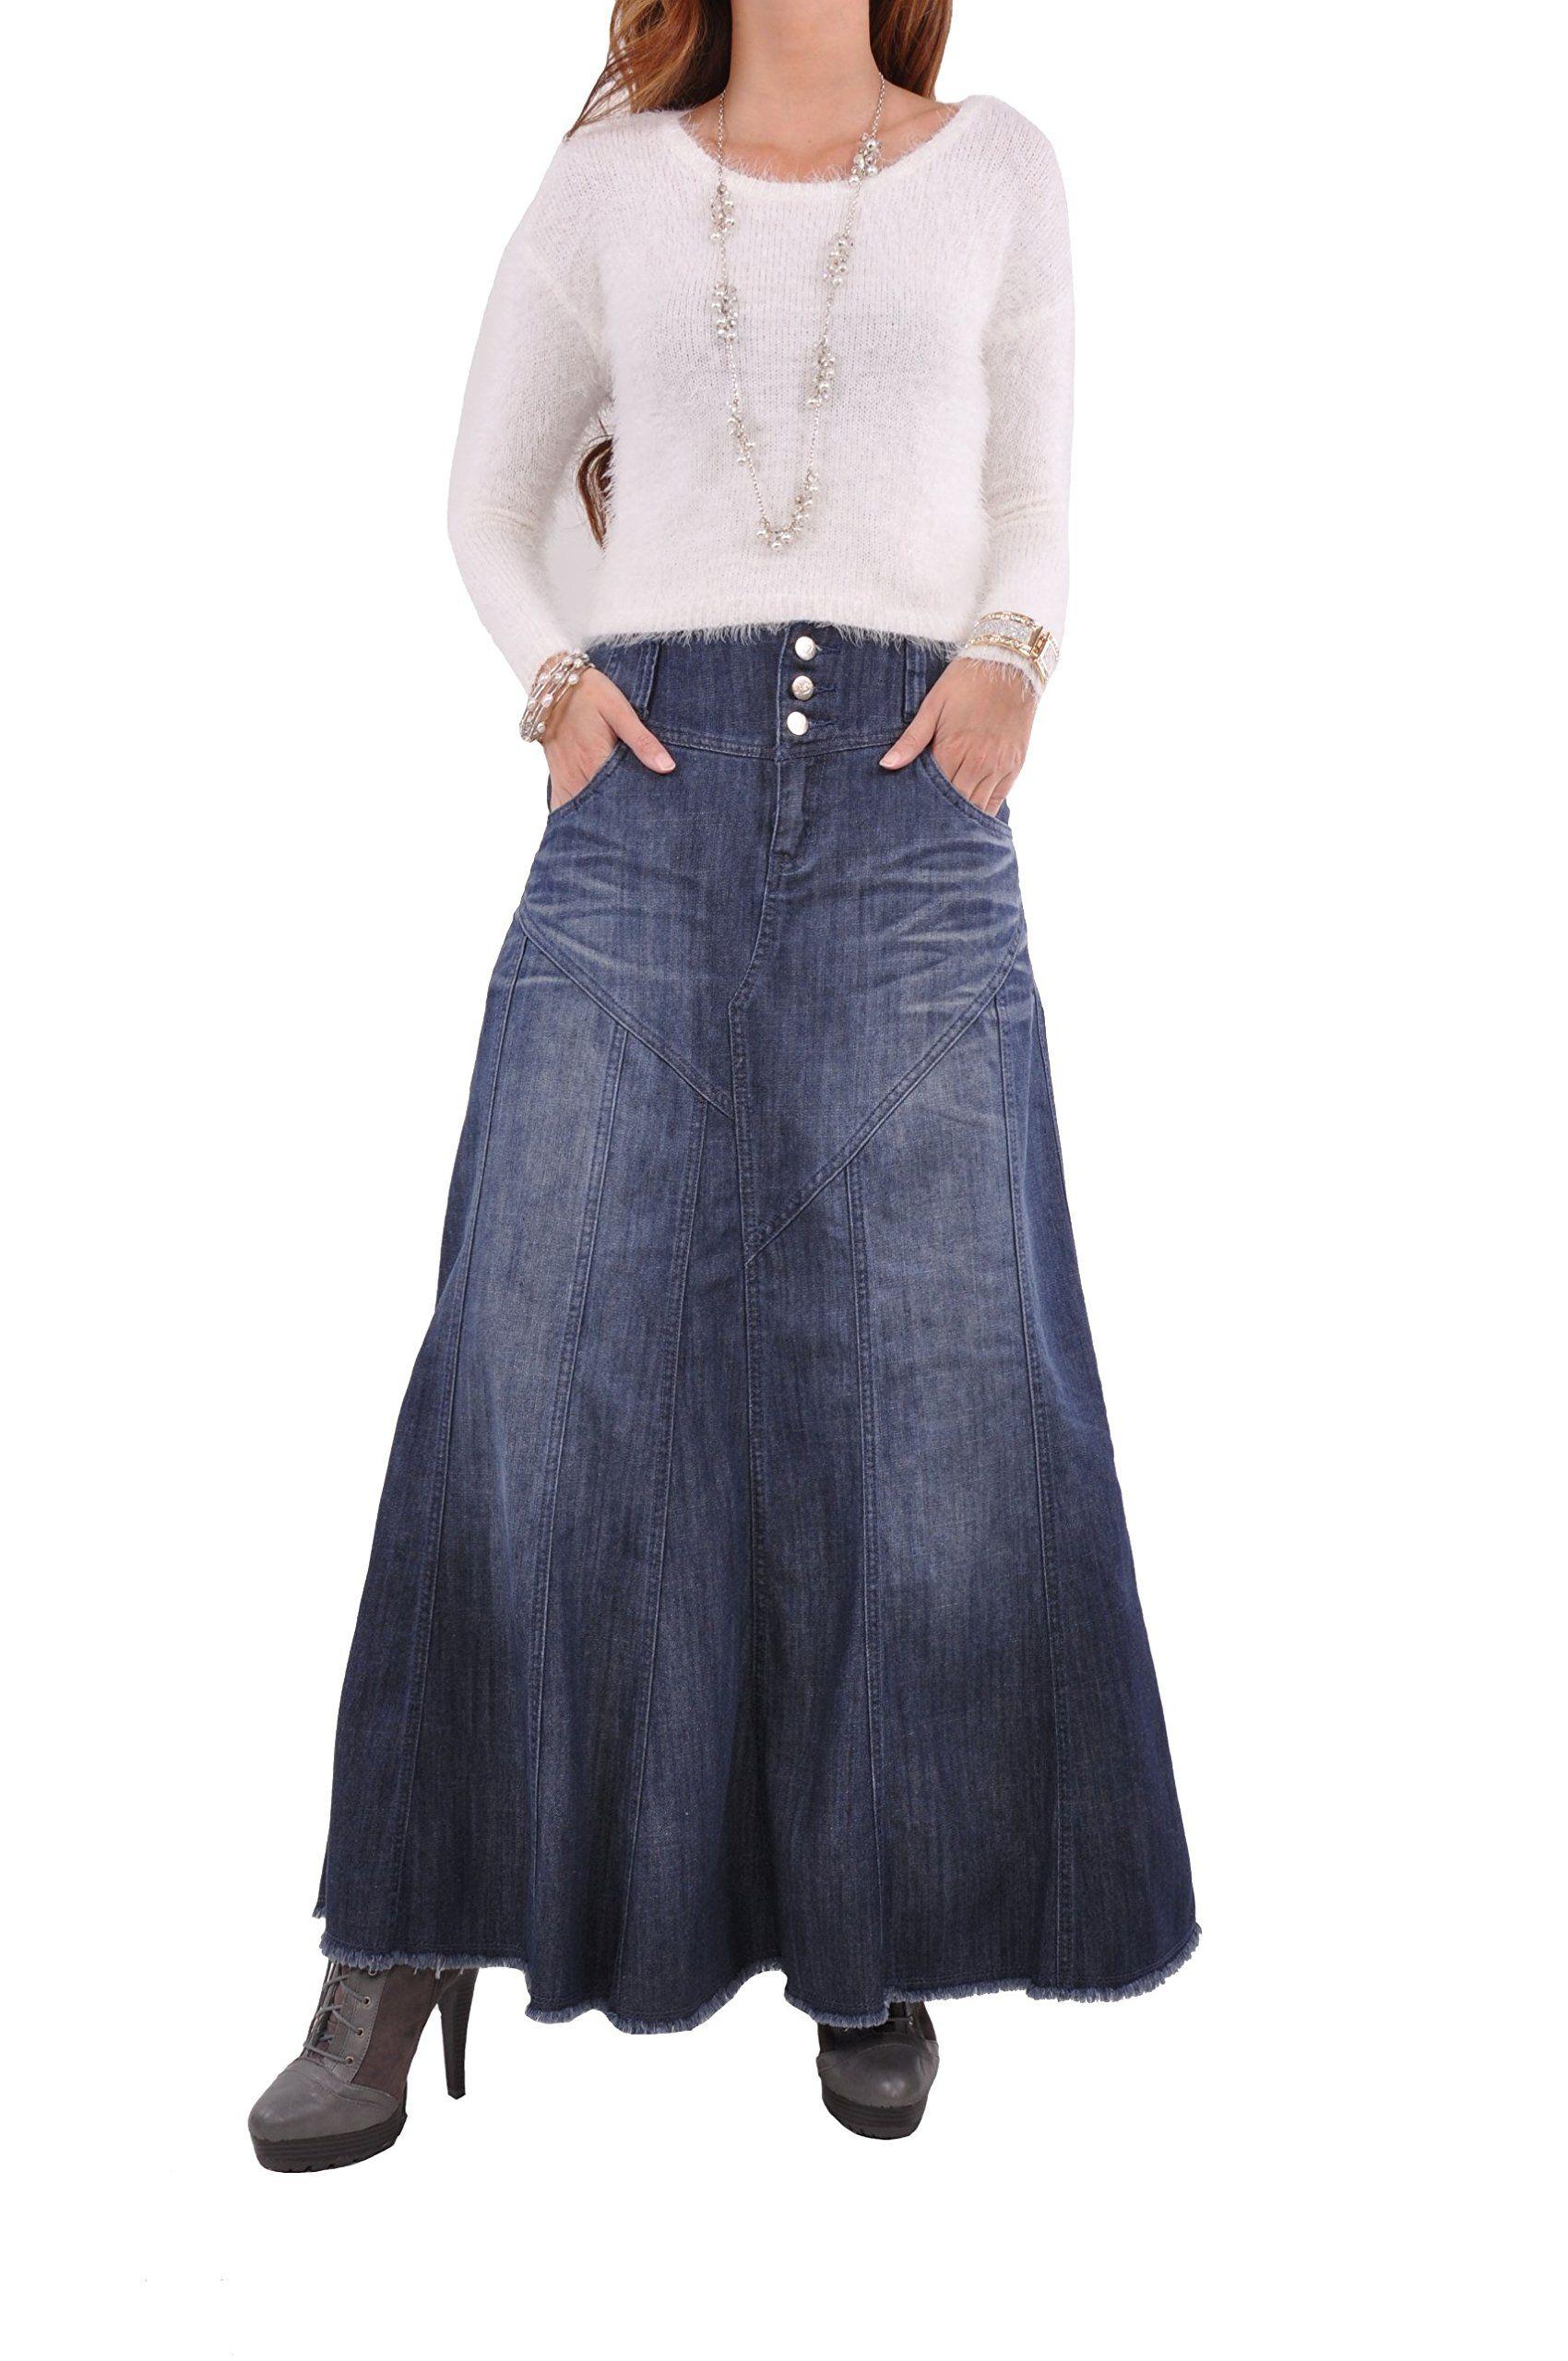 aad249097 Style J Gorgeous Flares Long Denim Skirt-Blue-26(6) at Amazon Women's  Clothing store: